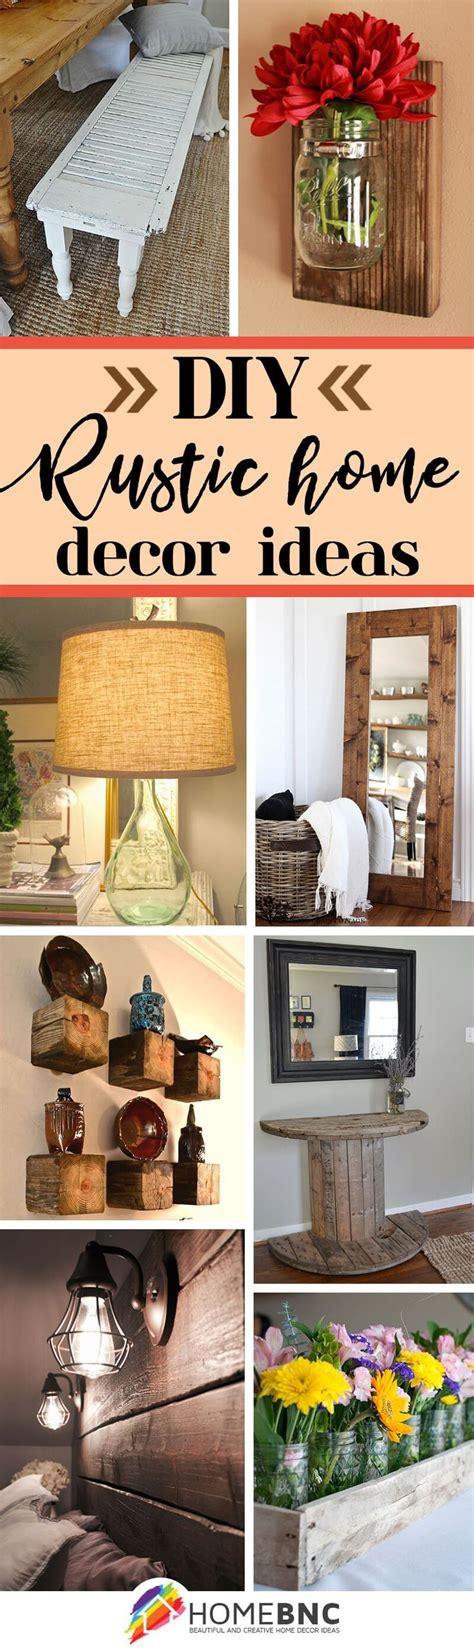 Diy Rustic Home Decor Ideas  Our Home Decor